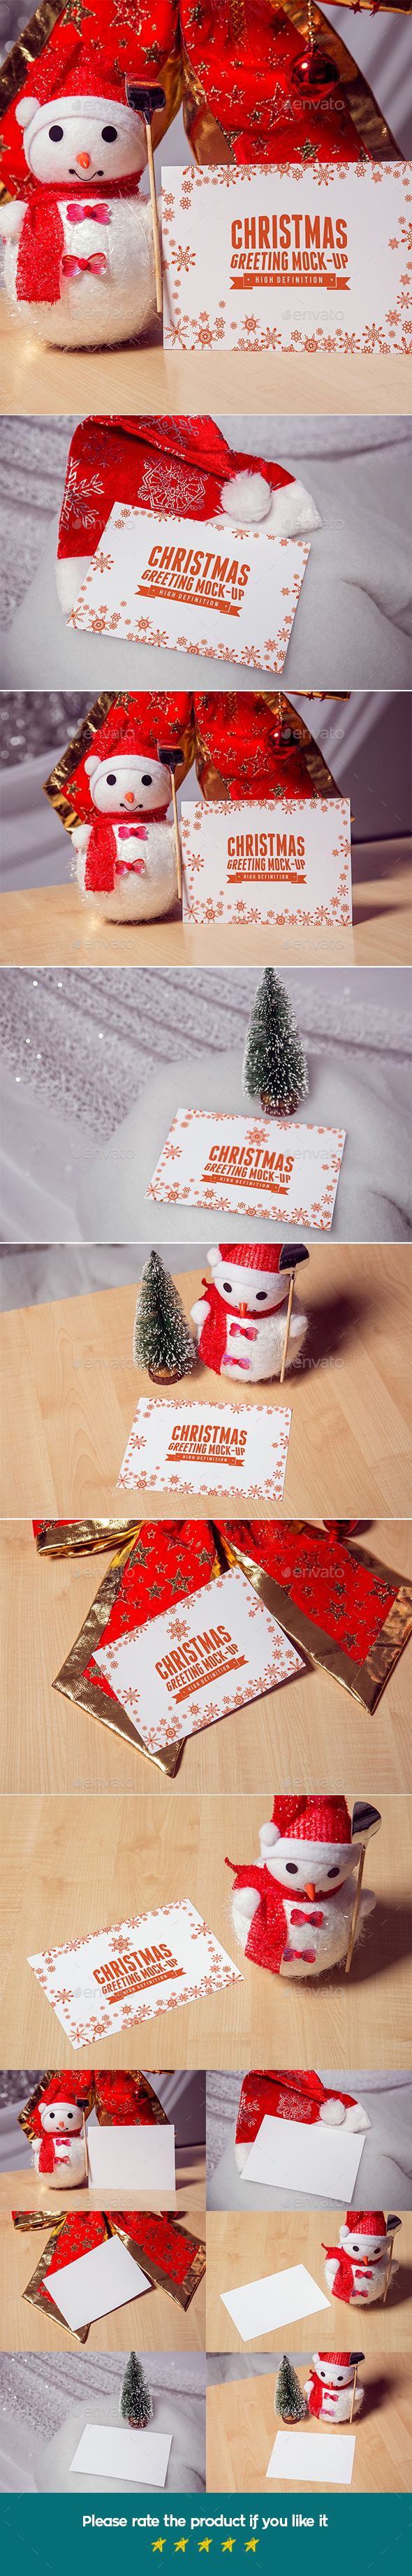 Photorealistic Christmas greeting Mock-Up.  - Print Product Mock-Ups